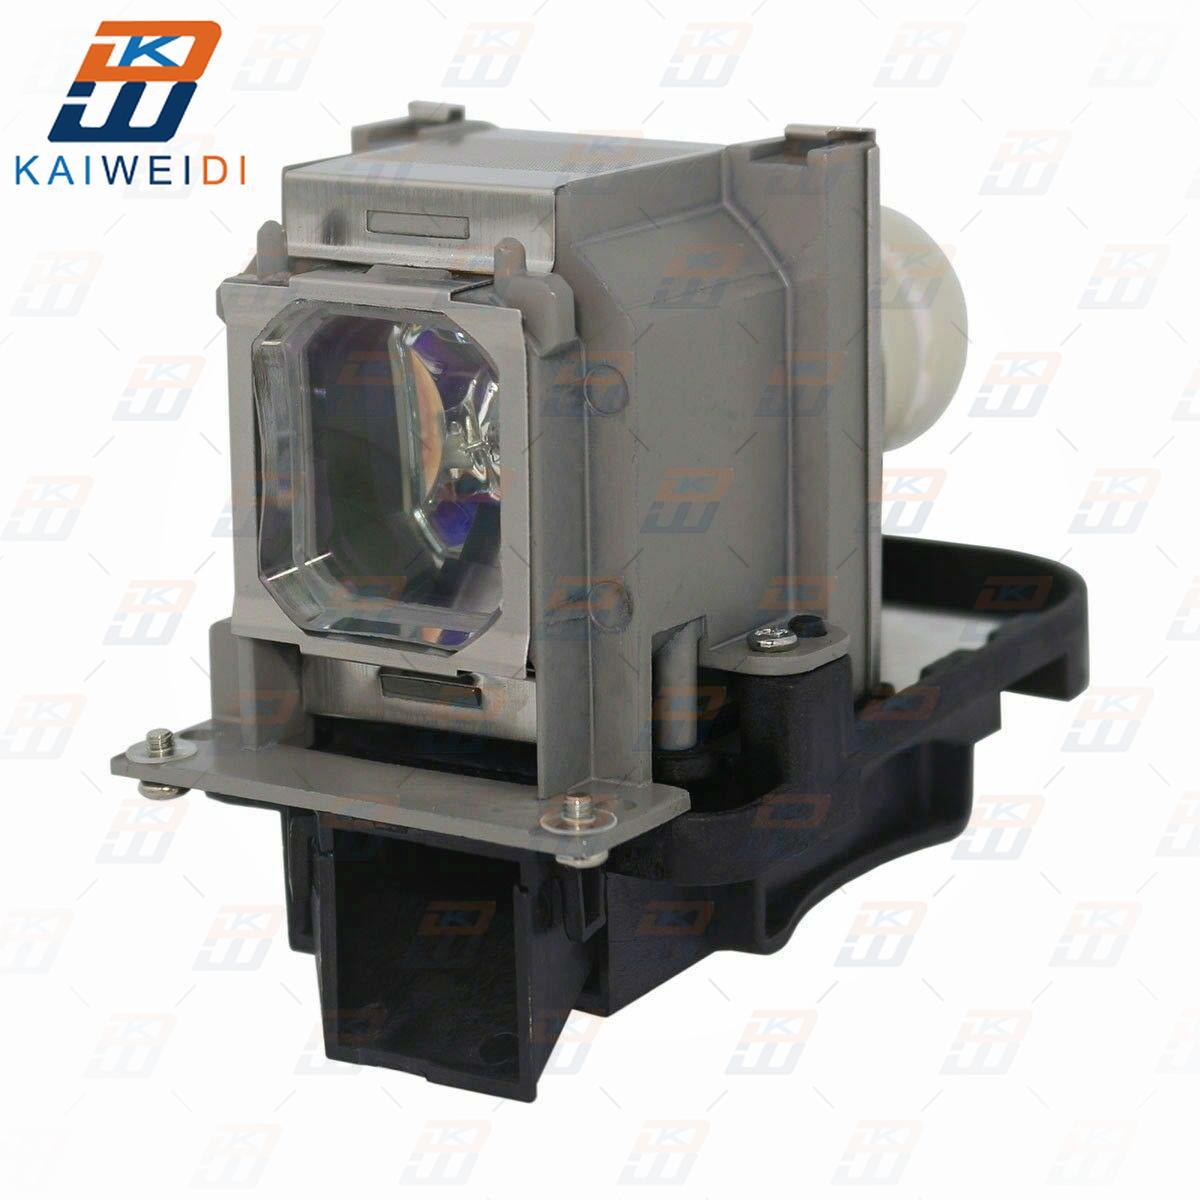 LMP-C280 lámpara de proyector profesional para Sony VPL-CW275, VPL-CX275, VPLCW275, VPLCX275, VPL-CW278, VPL-CX278, VPLCW278, VPLCX278